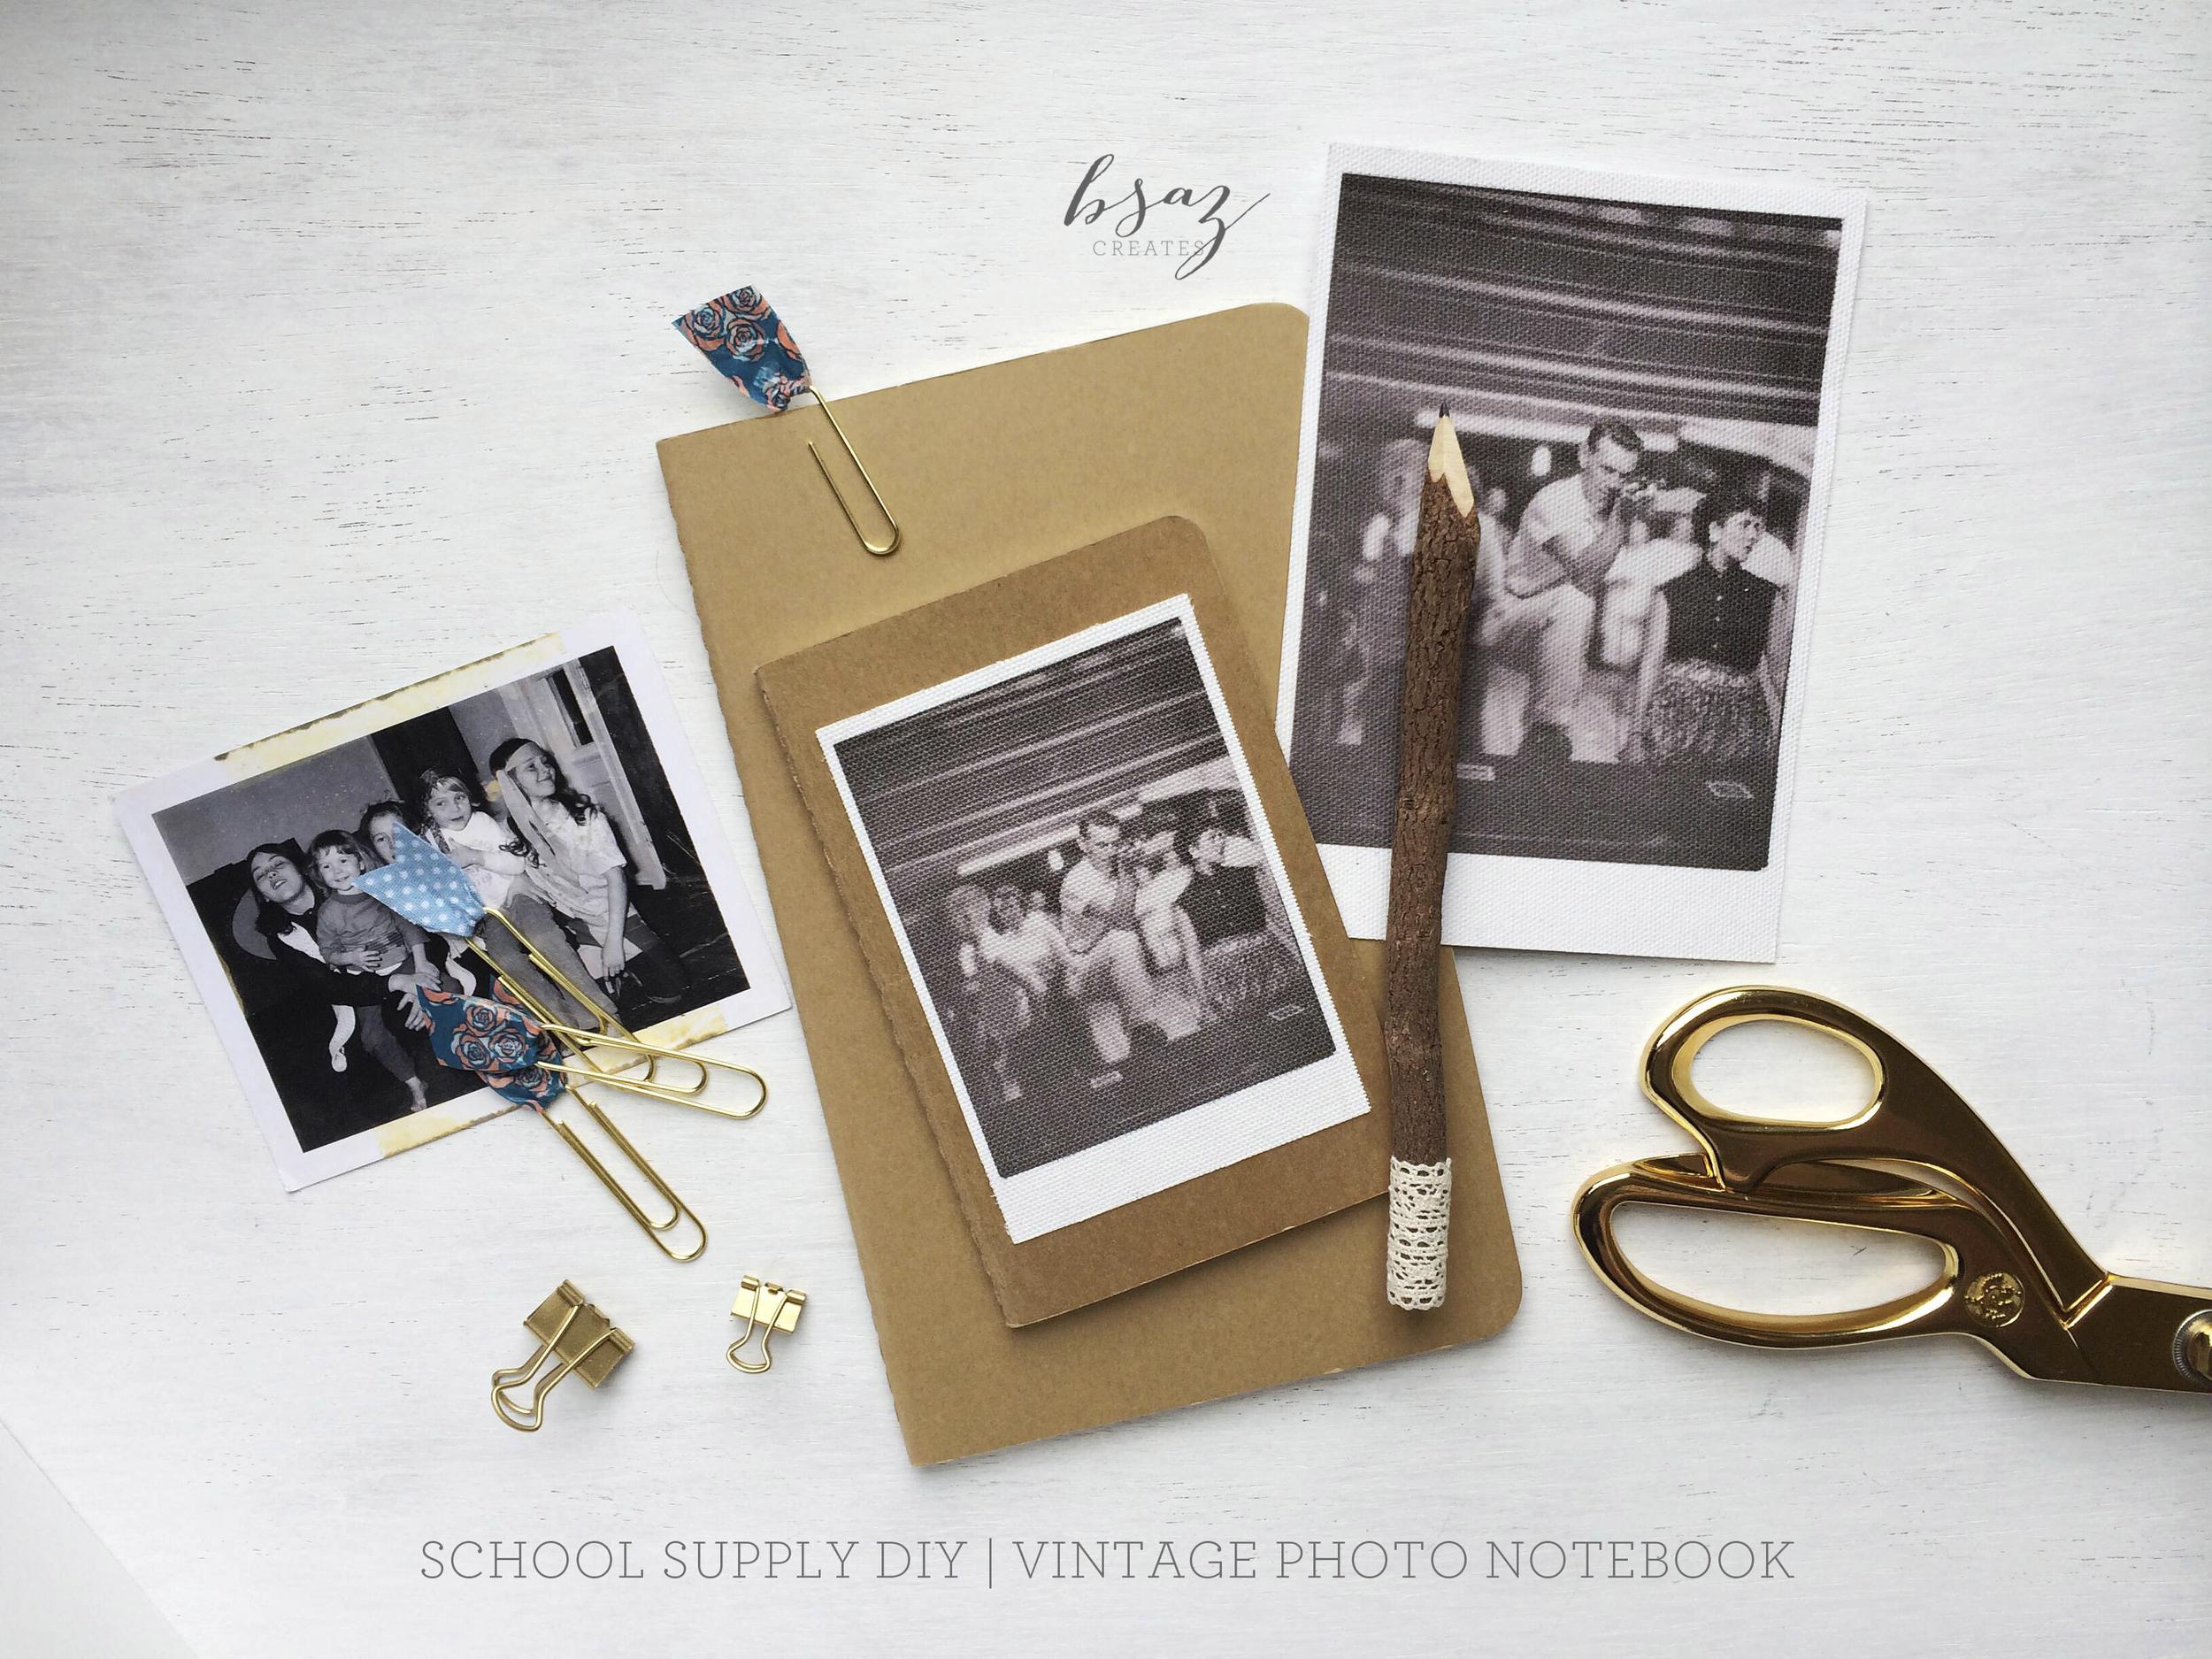 BSAZ CREATES   SCHOOL SUPPLY DIY   VINTAGE PHOTO NOTEBOOK